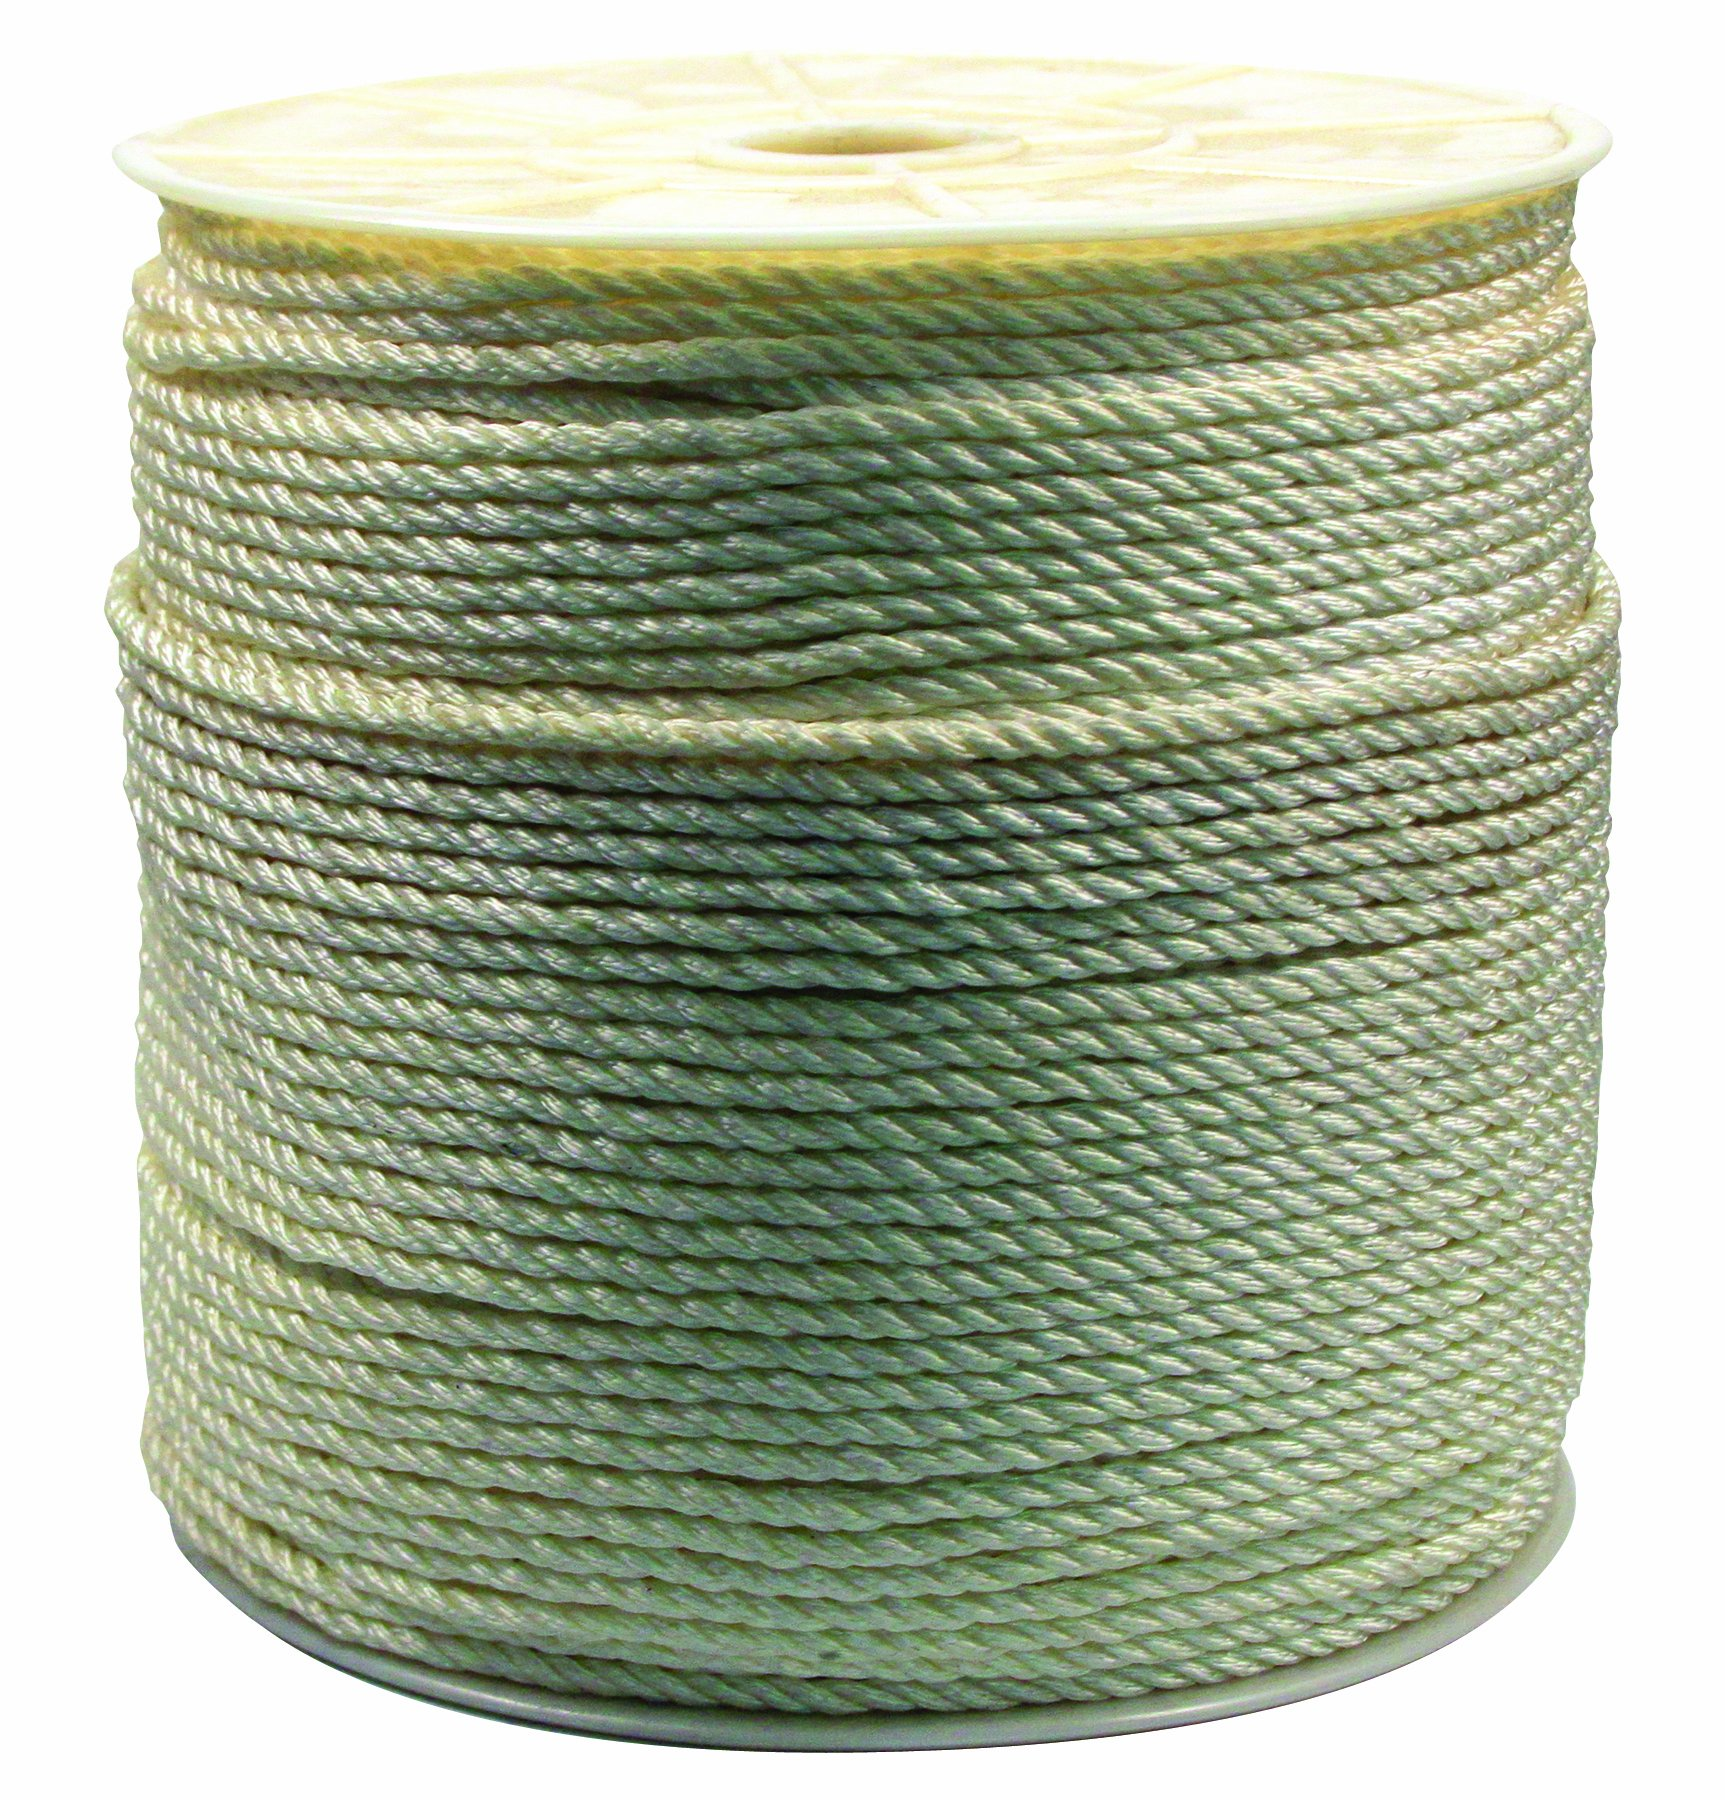 Rope King TN-141200 Twisted Nylon Rope 1/4 inch x 1,200 feet